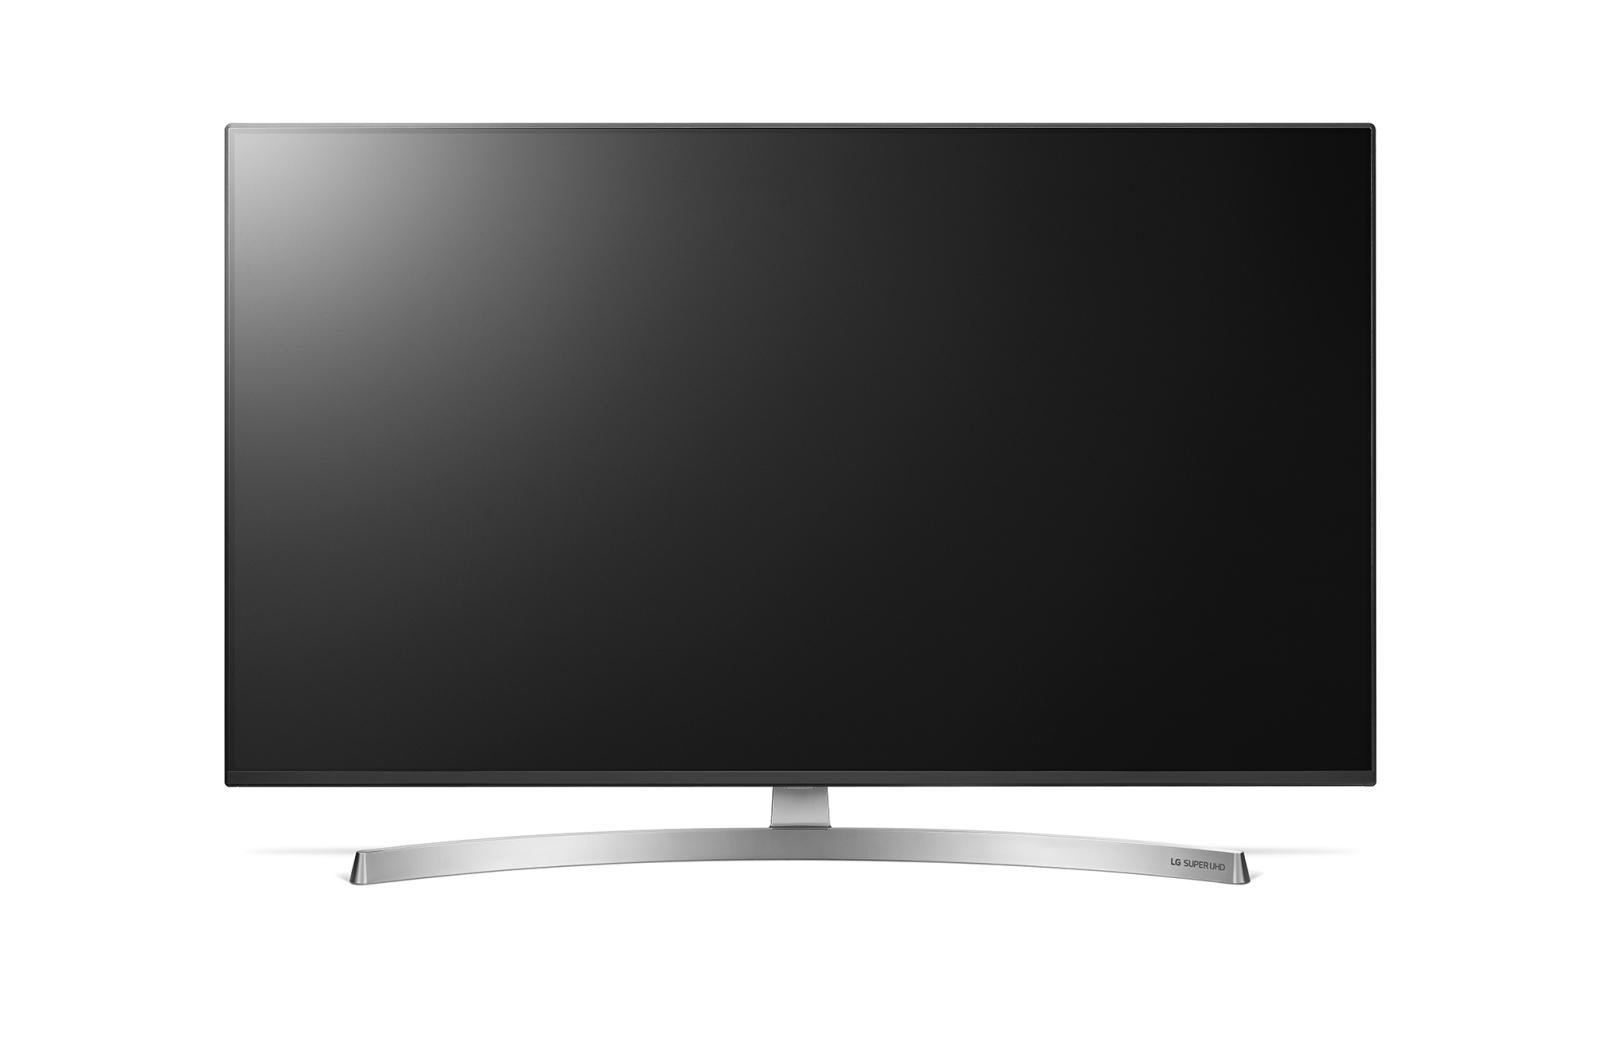 LG 55SK8500 telewizor 4K z AI